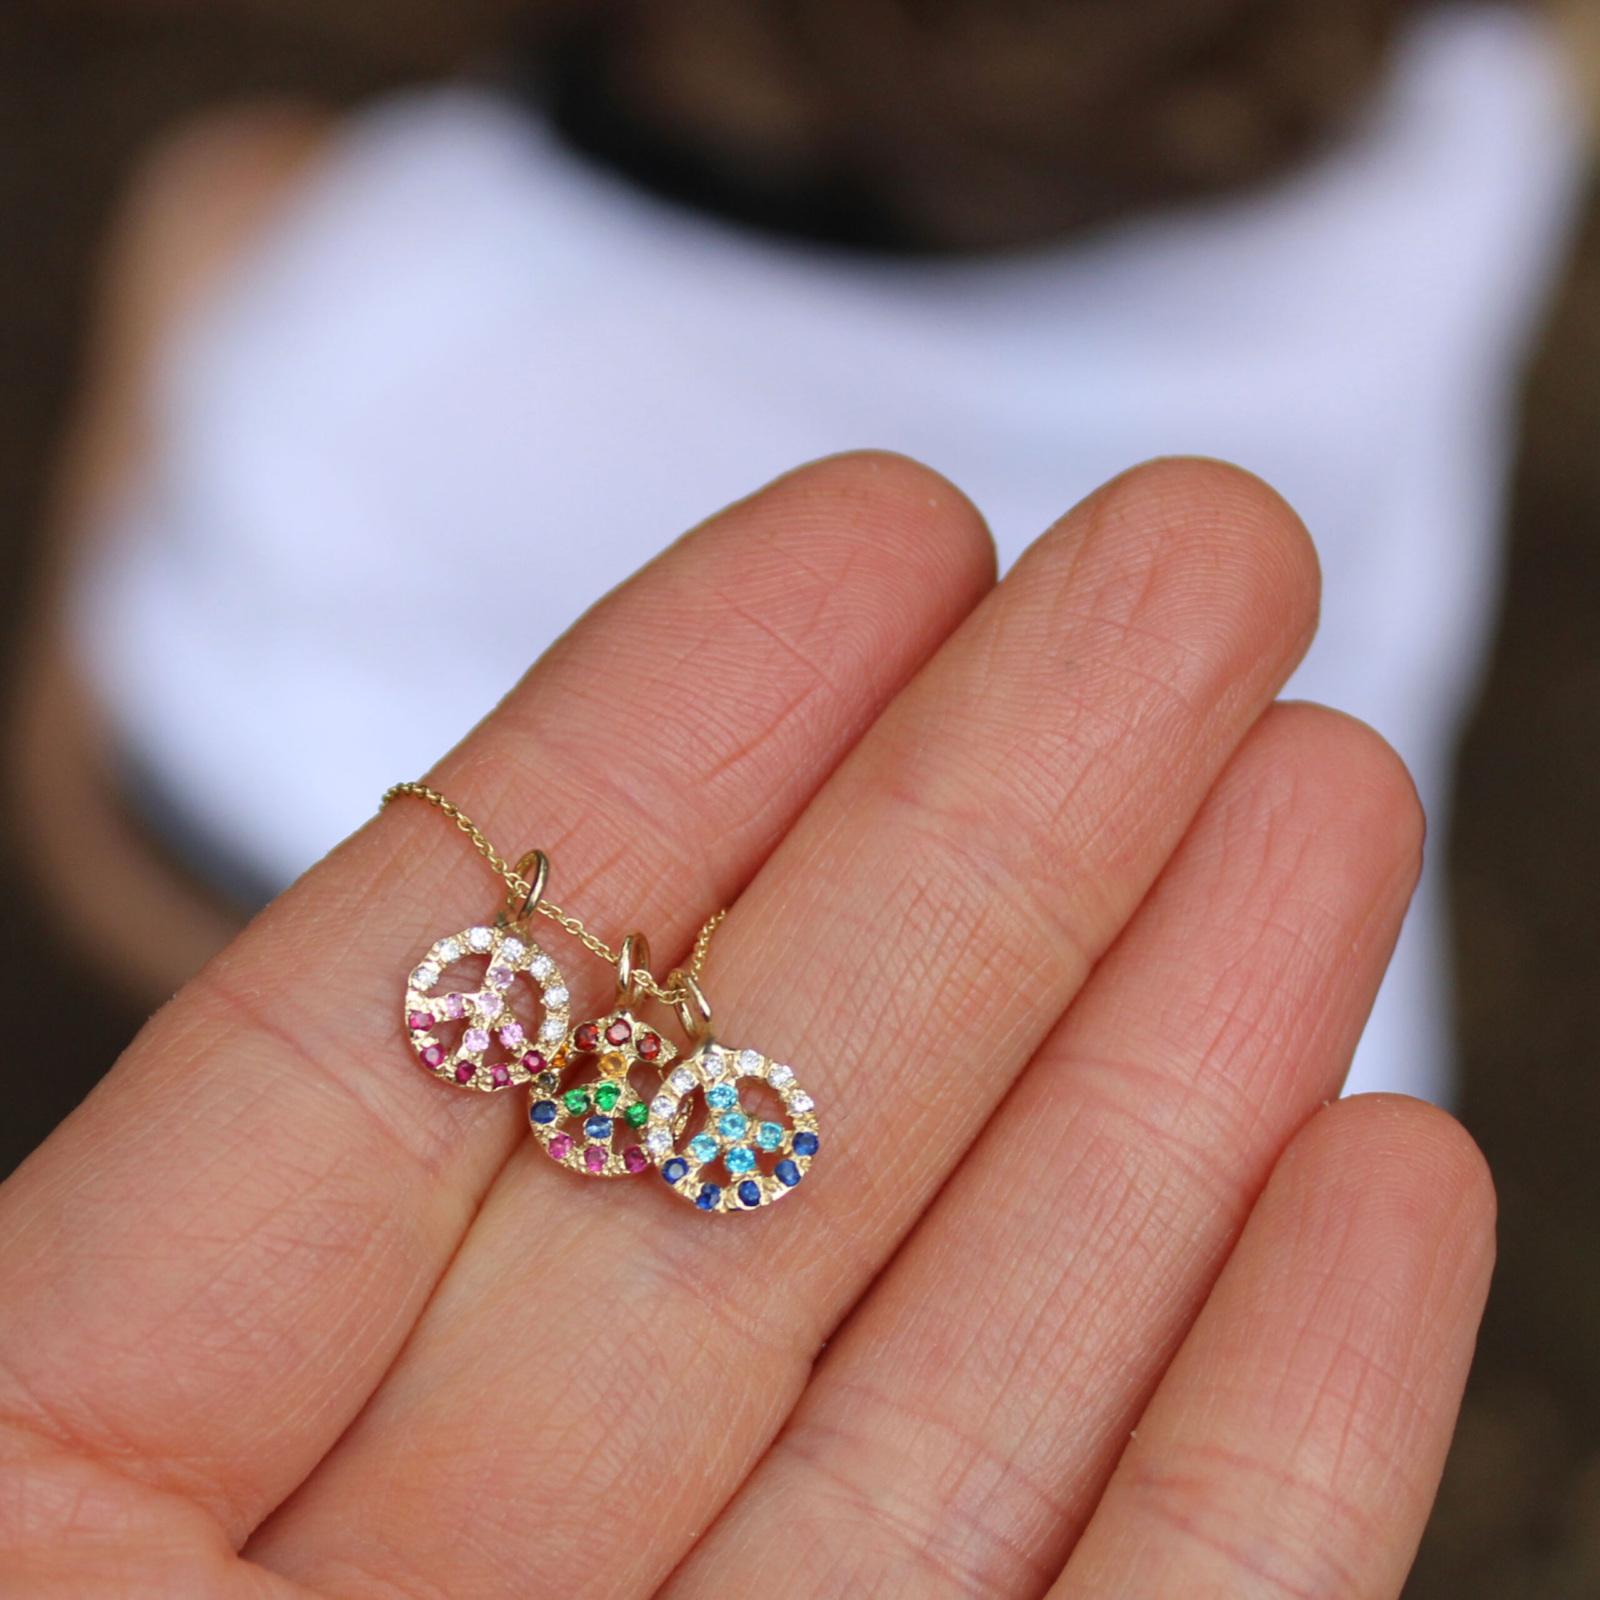 mini peace sign jewelry charms